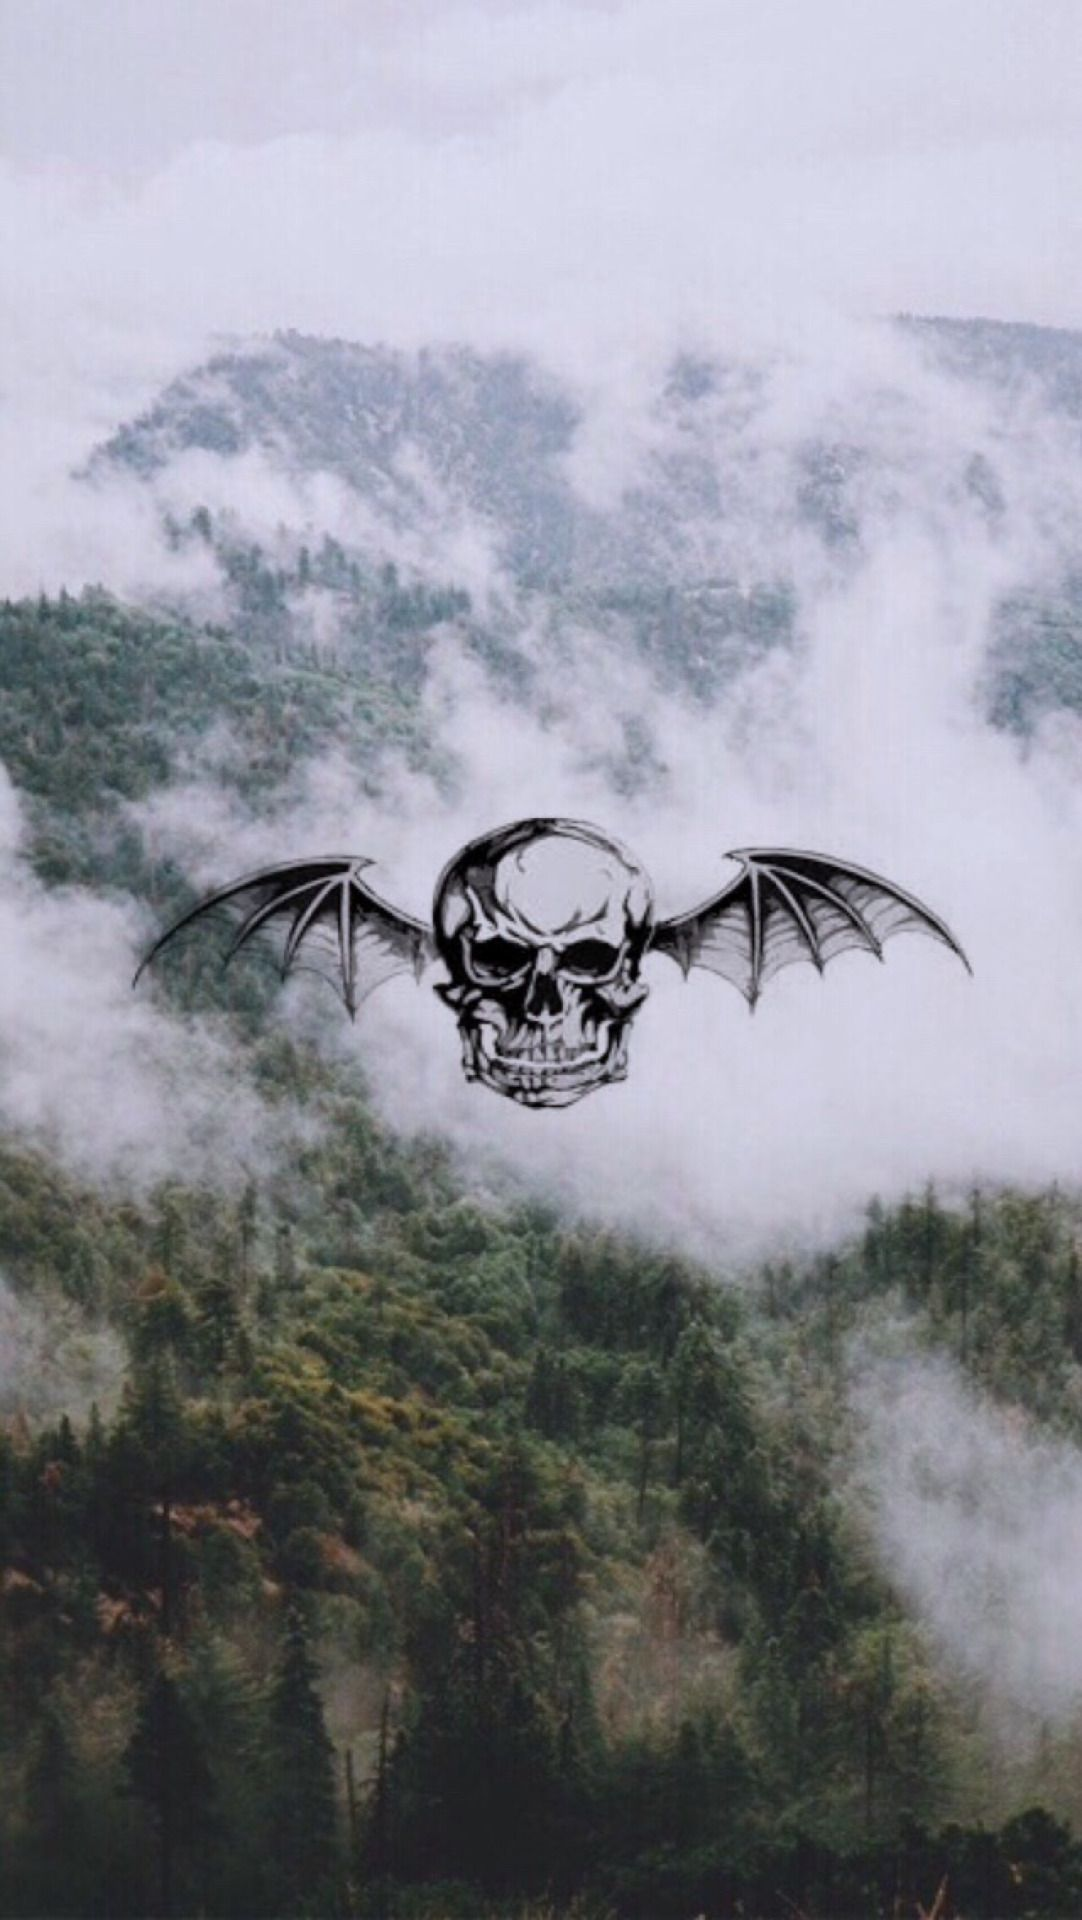 pretty epic deathbat wallpaper picture found on tumblr